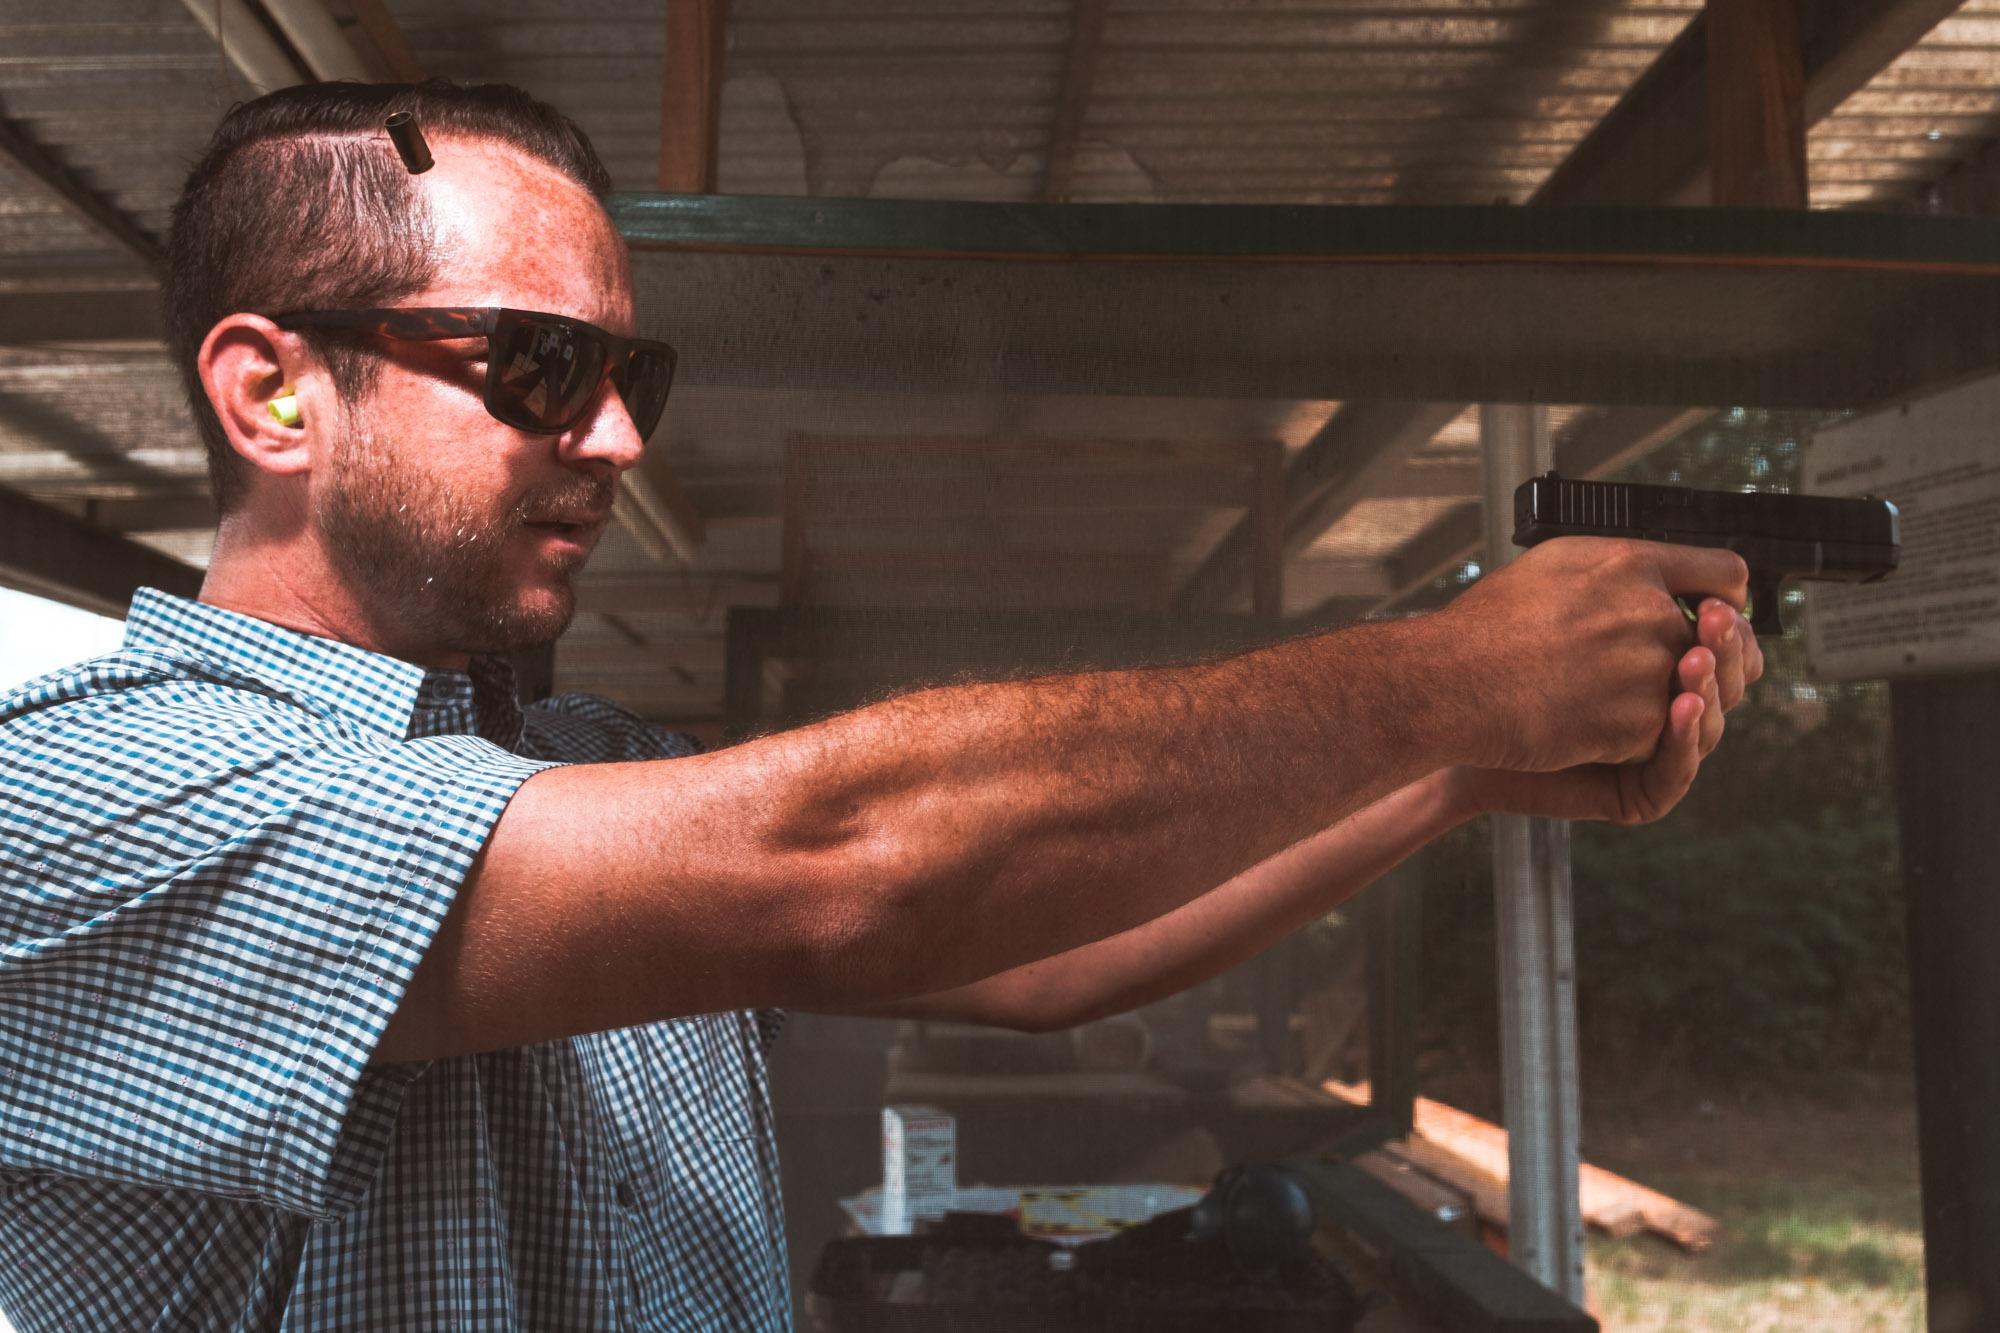 Ian Glock 9mm Garland Shooting Range